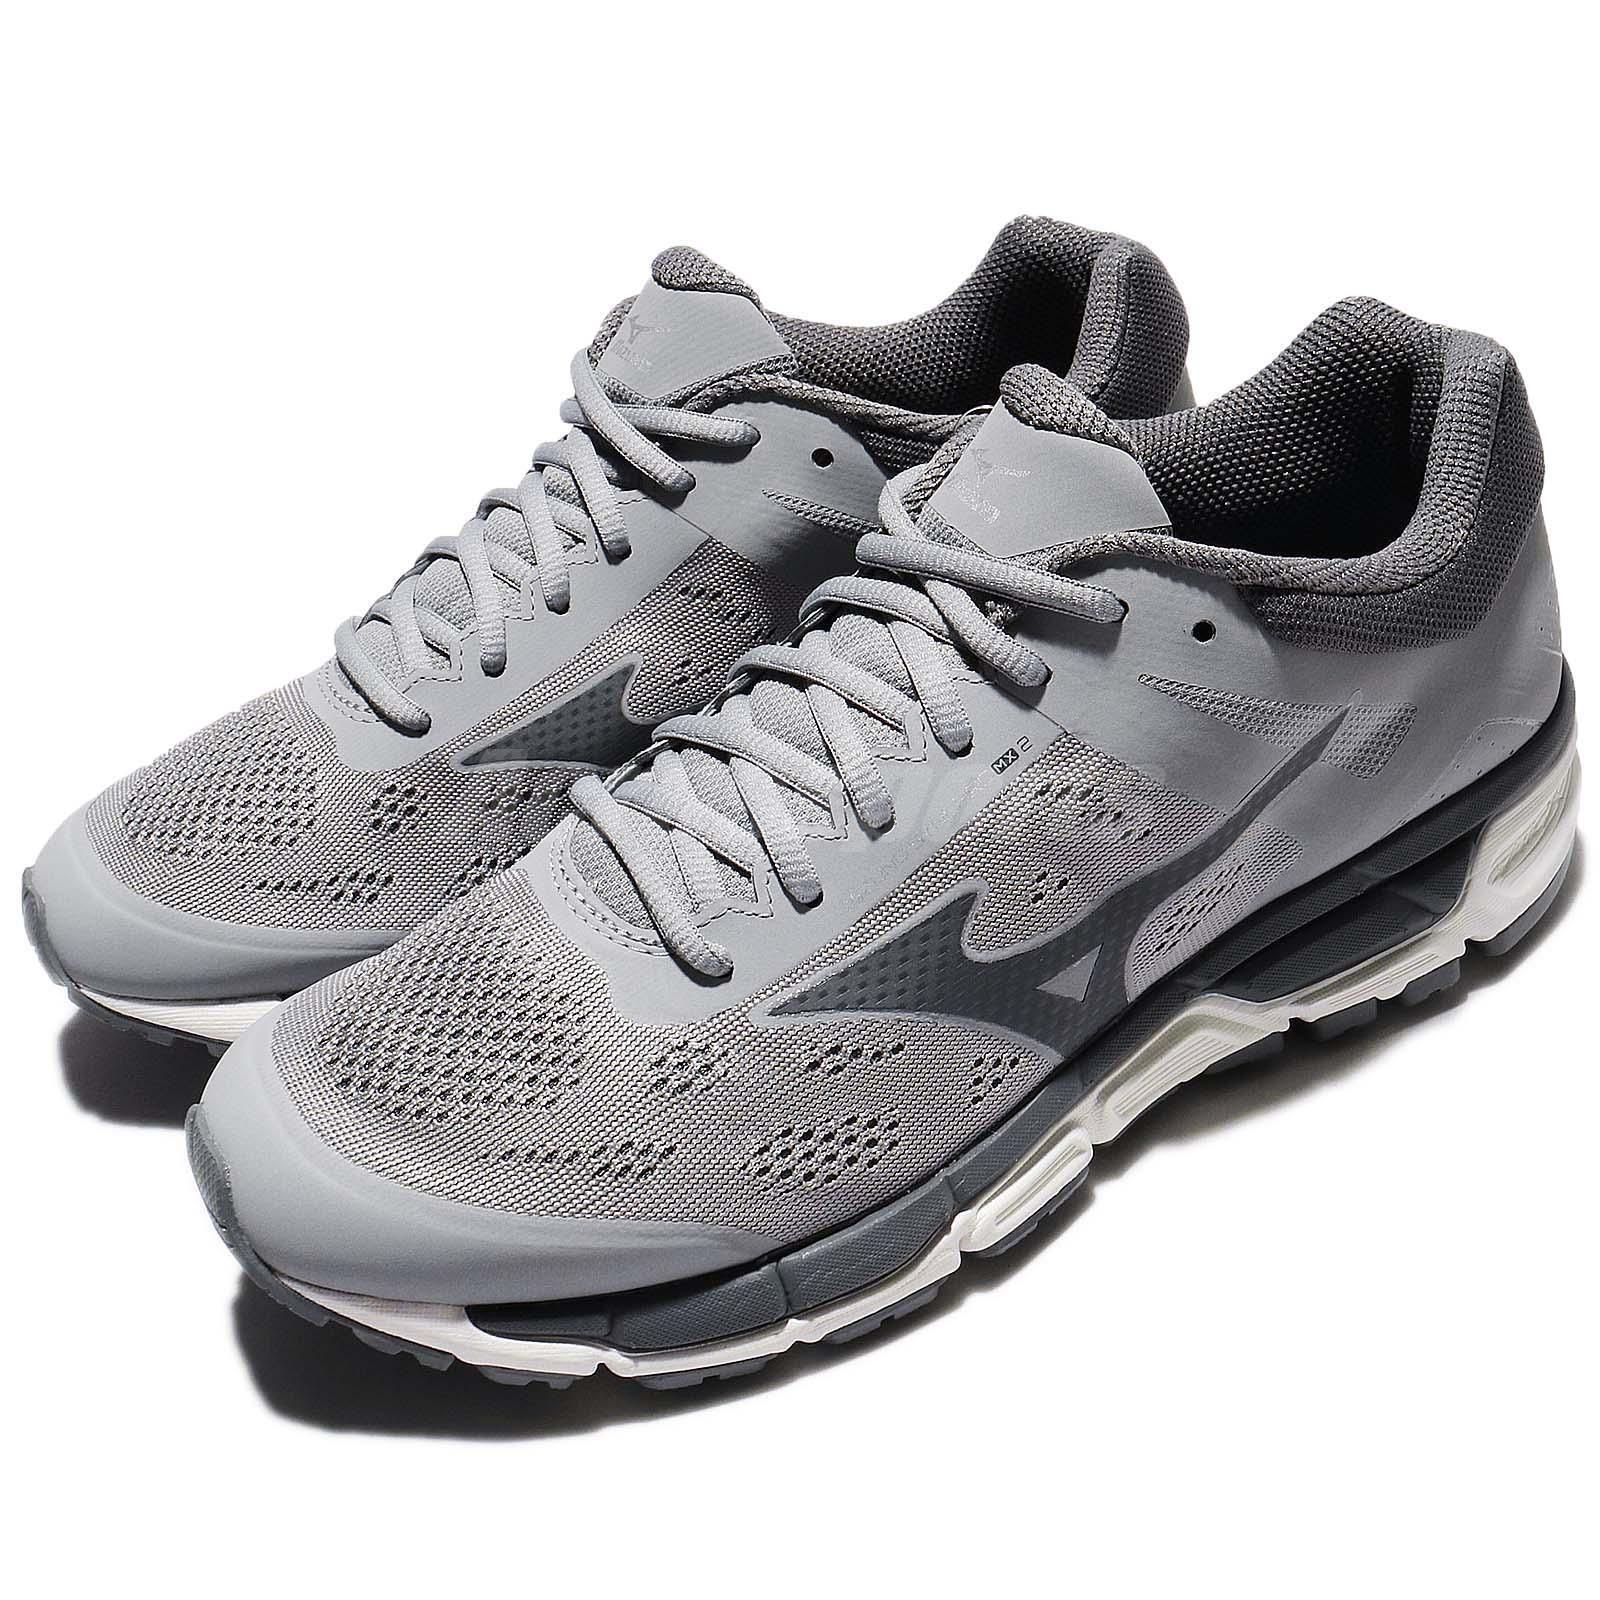 Mizuno Synchro MX2 gris negro Mens Running zapatos J1GE17-1948